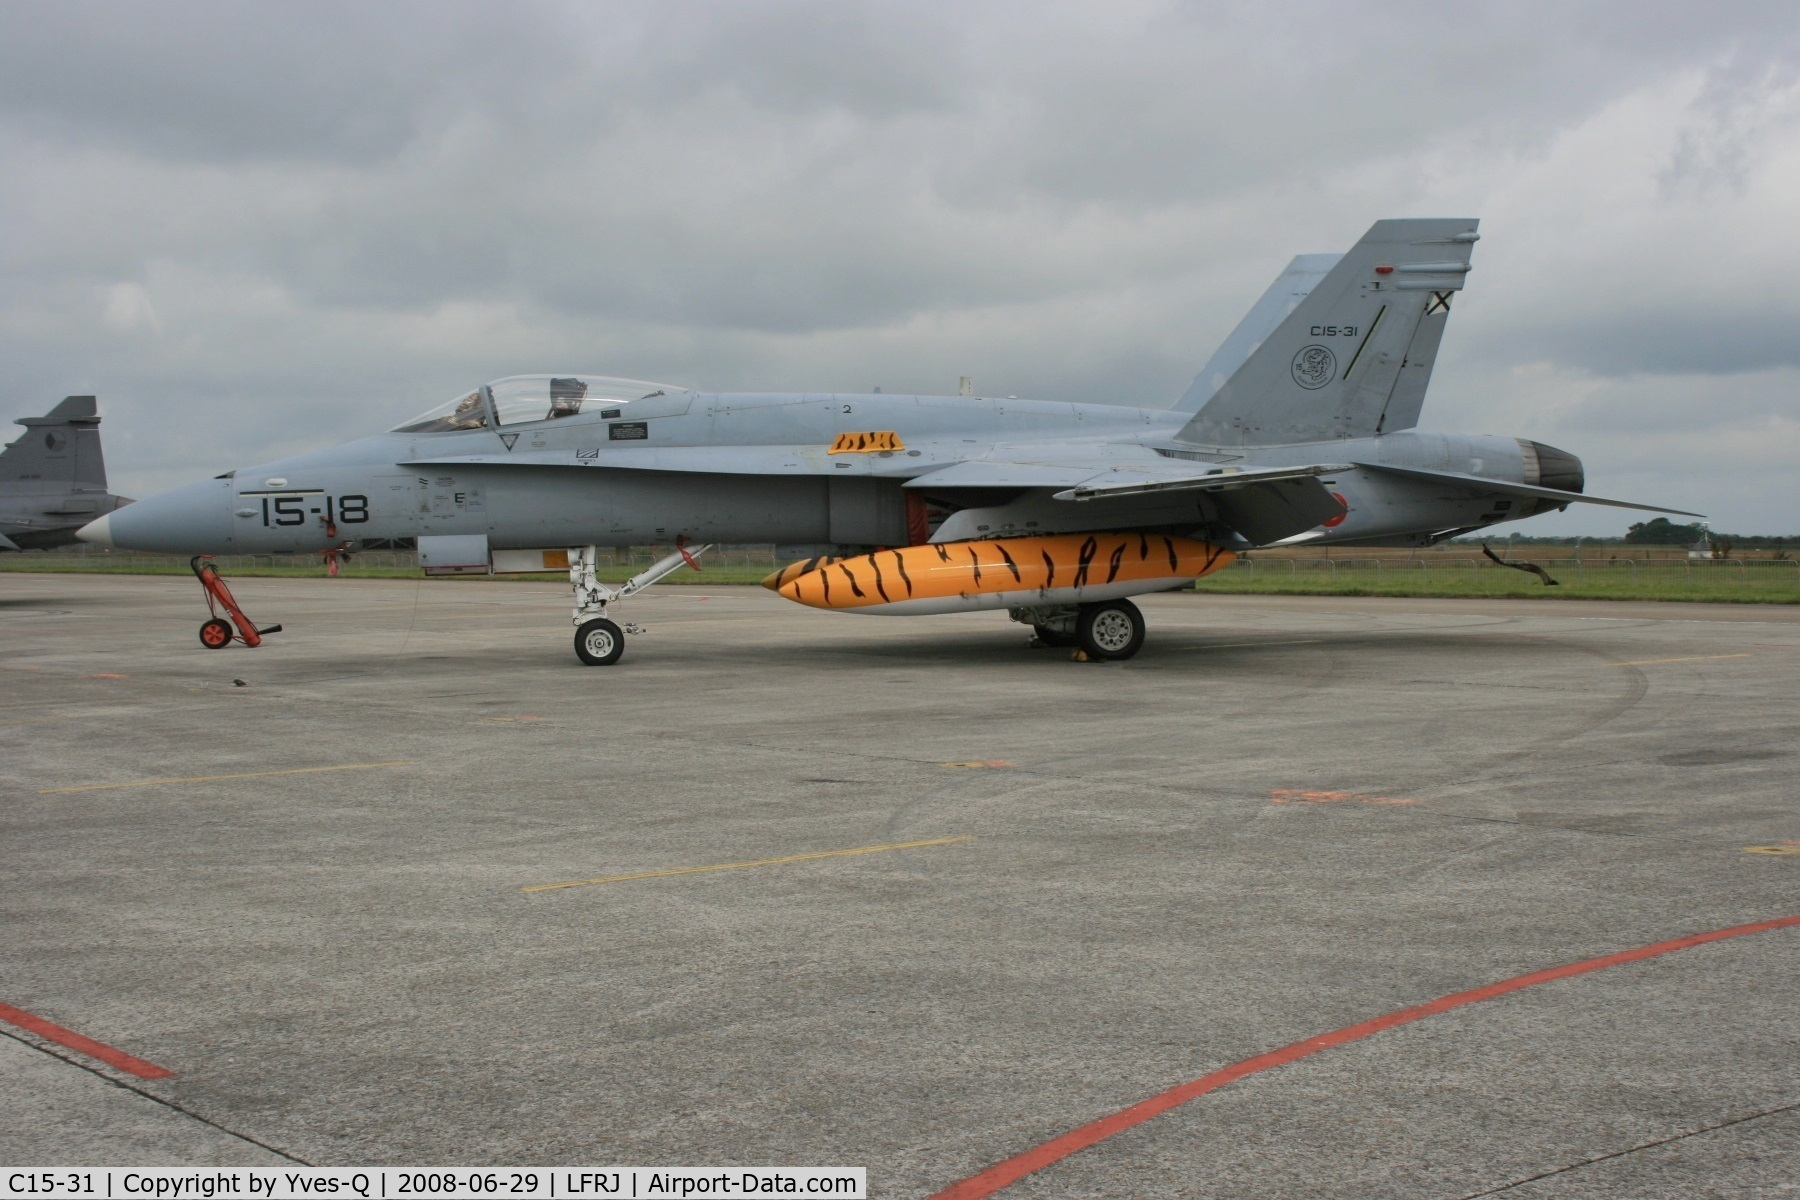 C15-31, McDonnell Douglas EF-18A Hornet C/N 0533/A442, Spanish Air Force McDonnell Douglas EF-18A  Block 23 - C15-31, Landivisiau Naval Air Base (LFRJ)